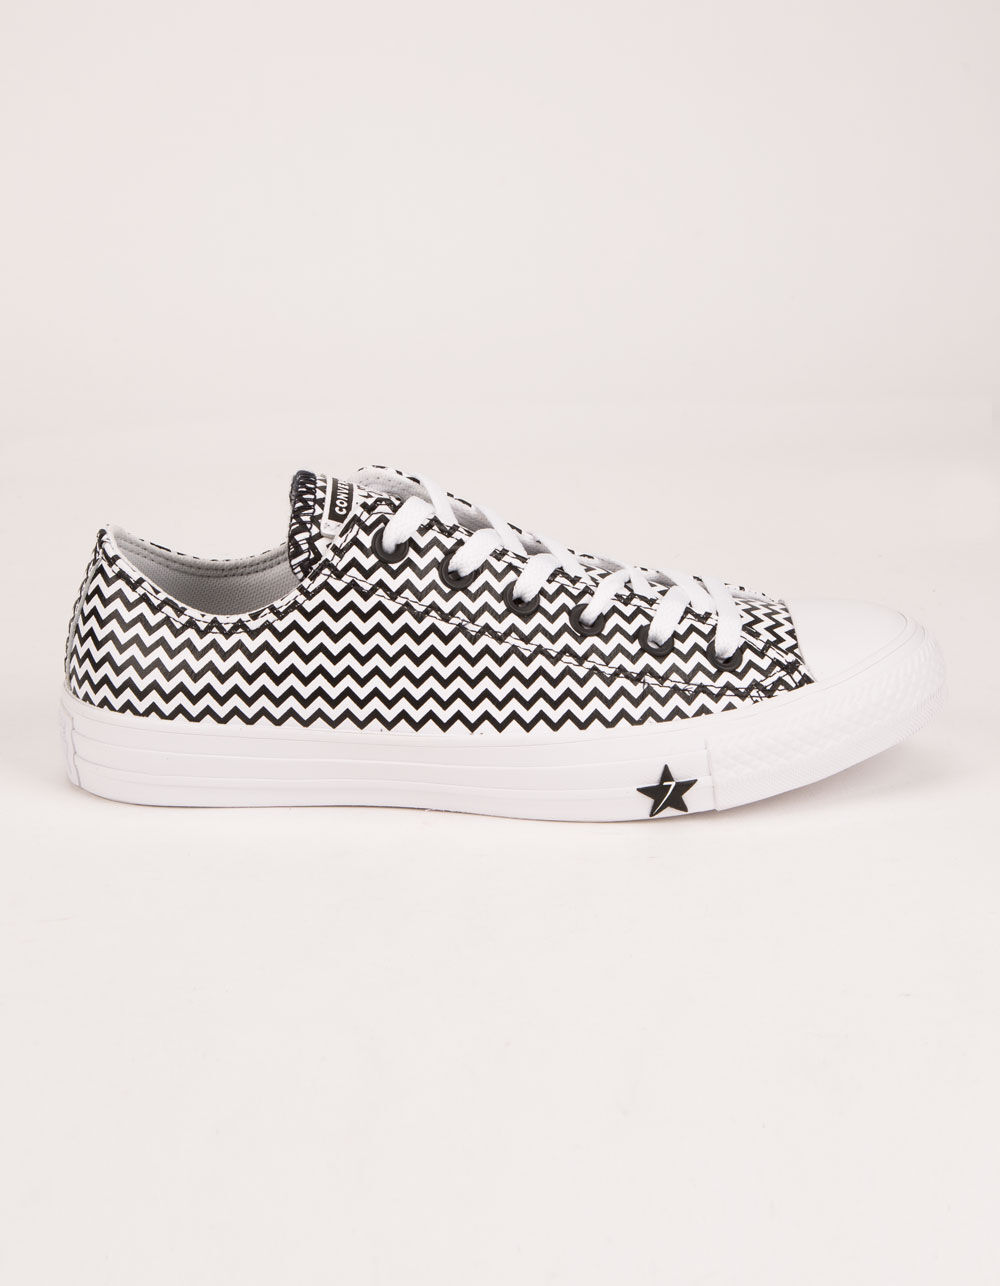 CONVERSE CTAS OX White & Converse Black Shoes